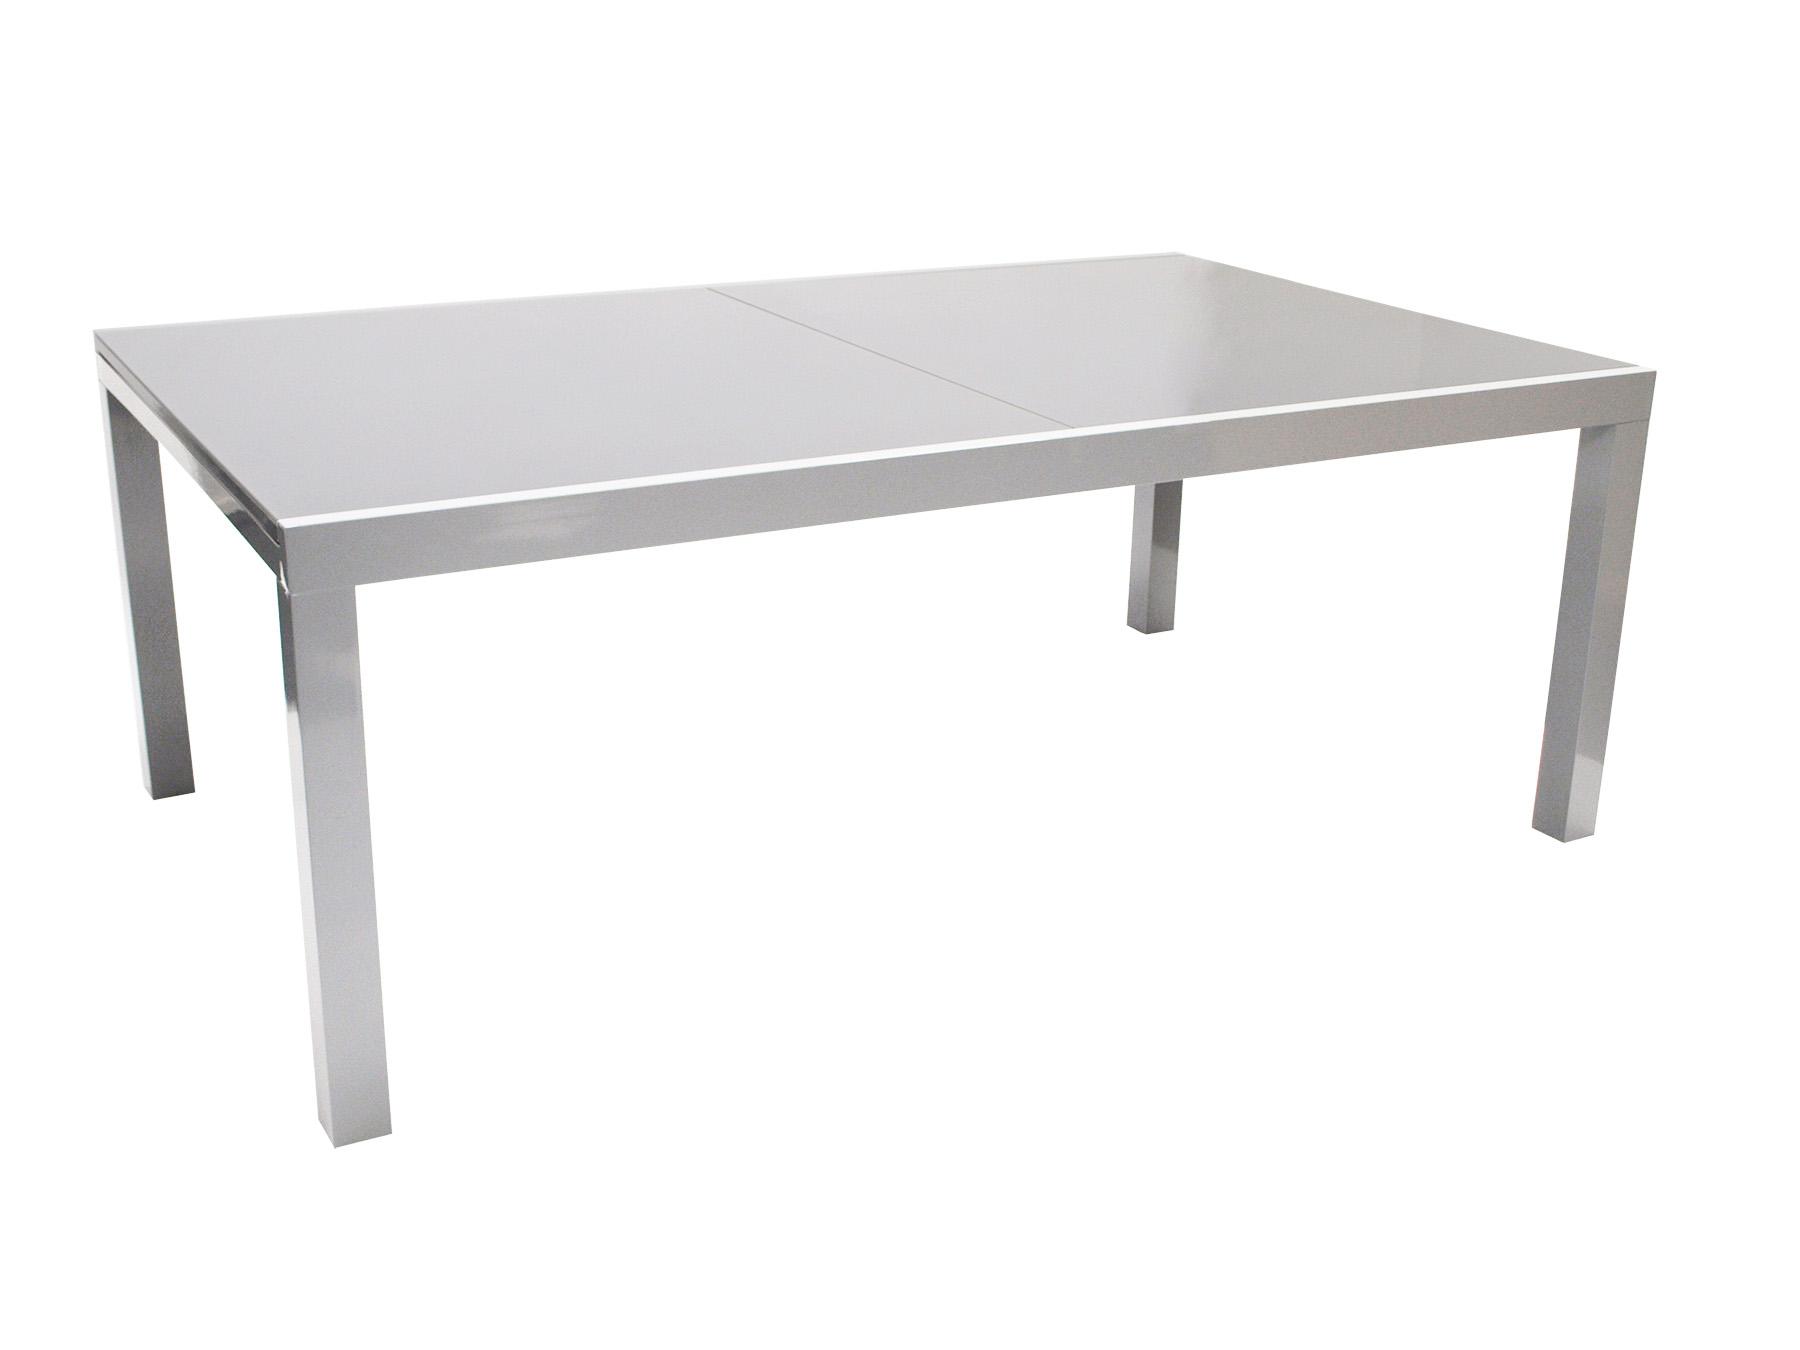 Ausziehtisch MARINA 180/240x100cm, Aluminium + Glas grau